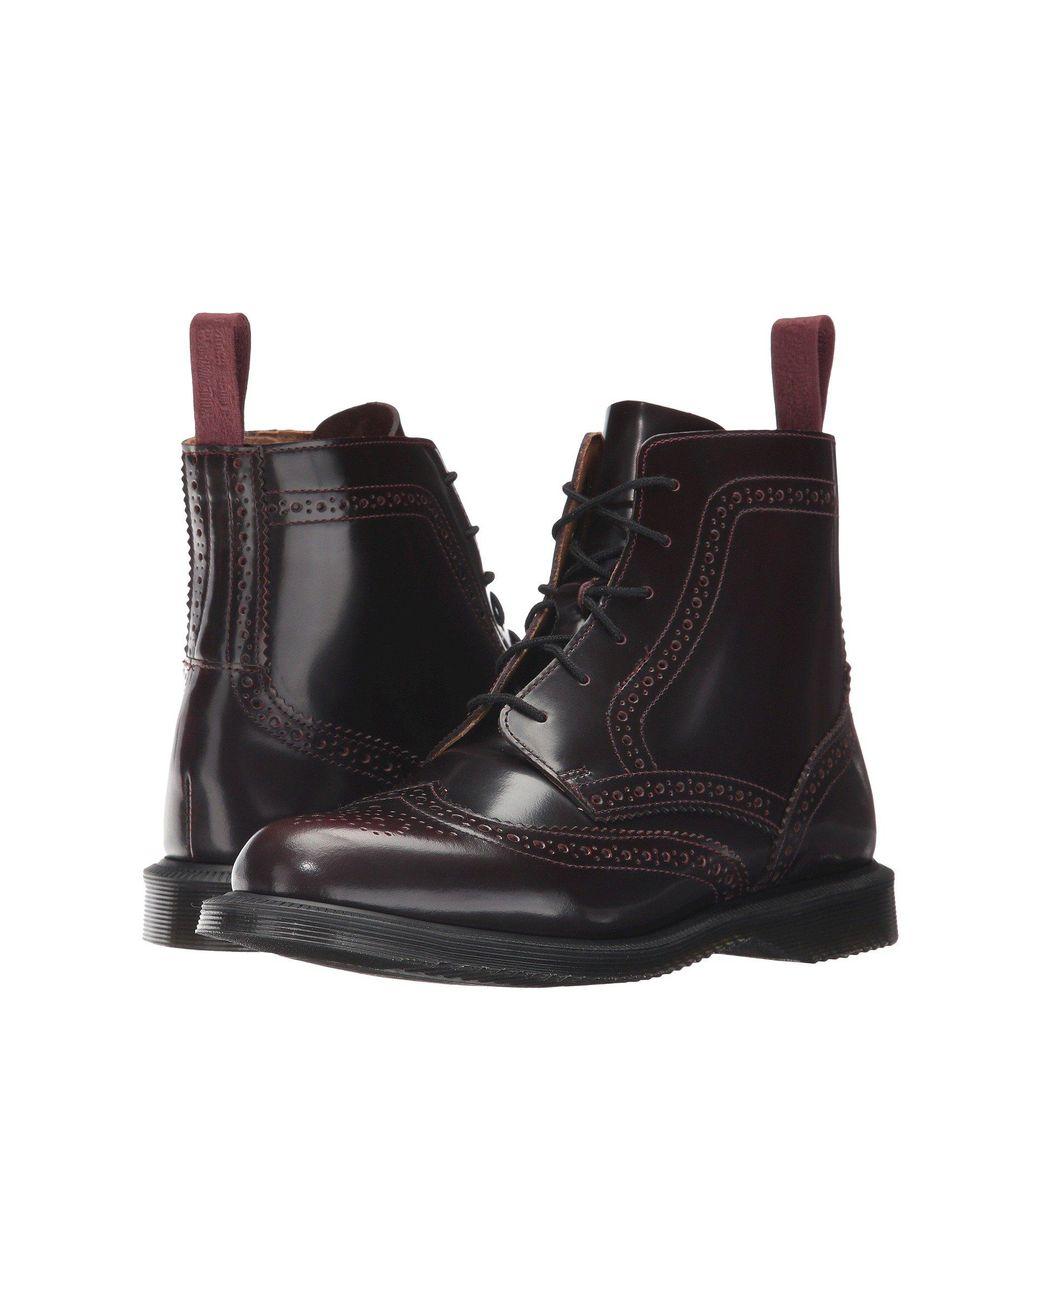 4da26533724 Women's Delphine 6-eye Brogue Boot